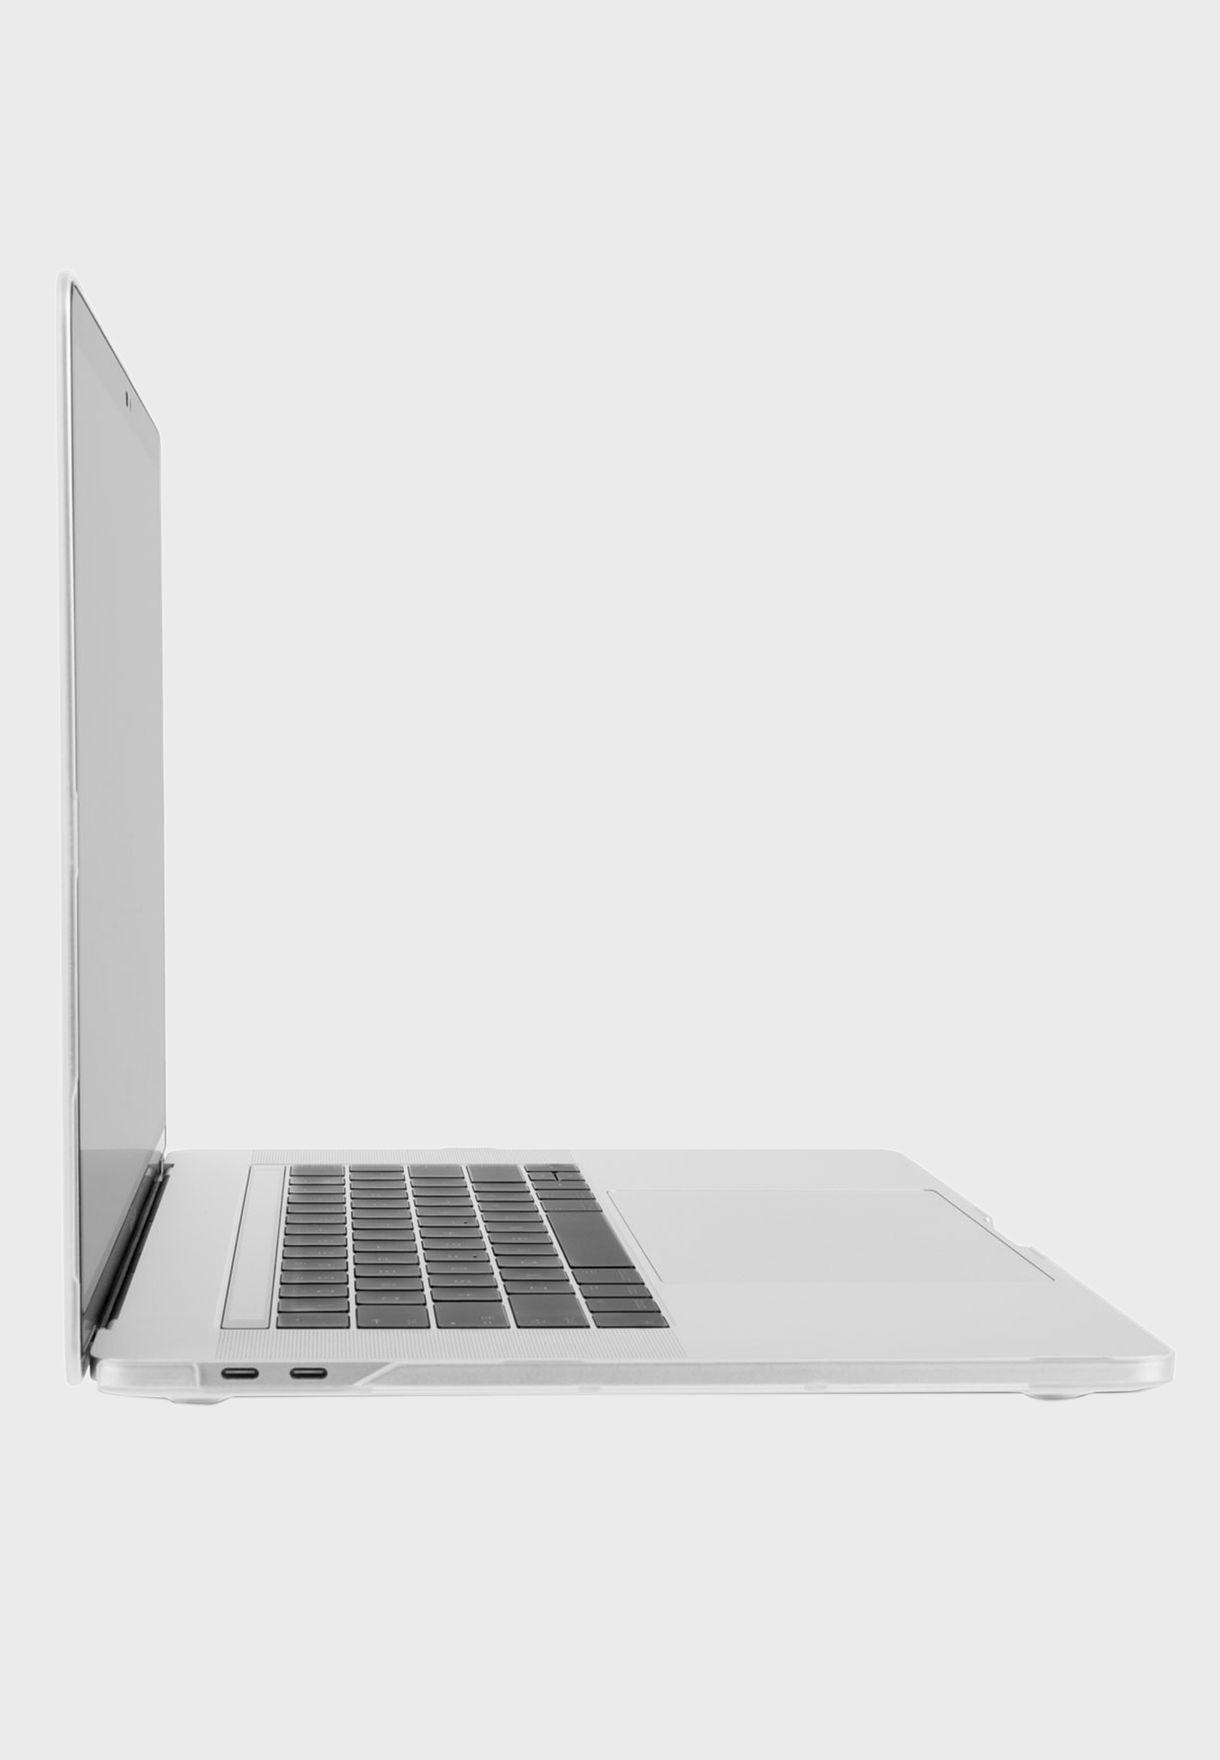 iGlaze Macbook Pro 15 Case